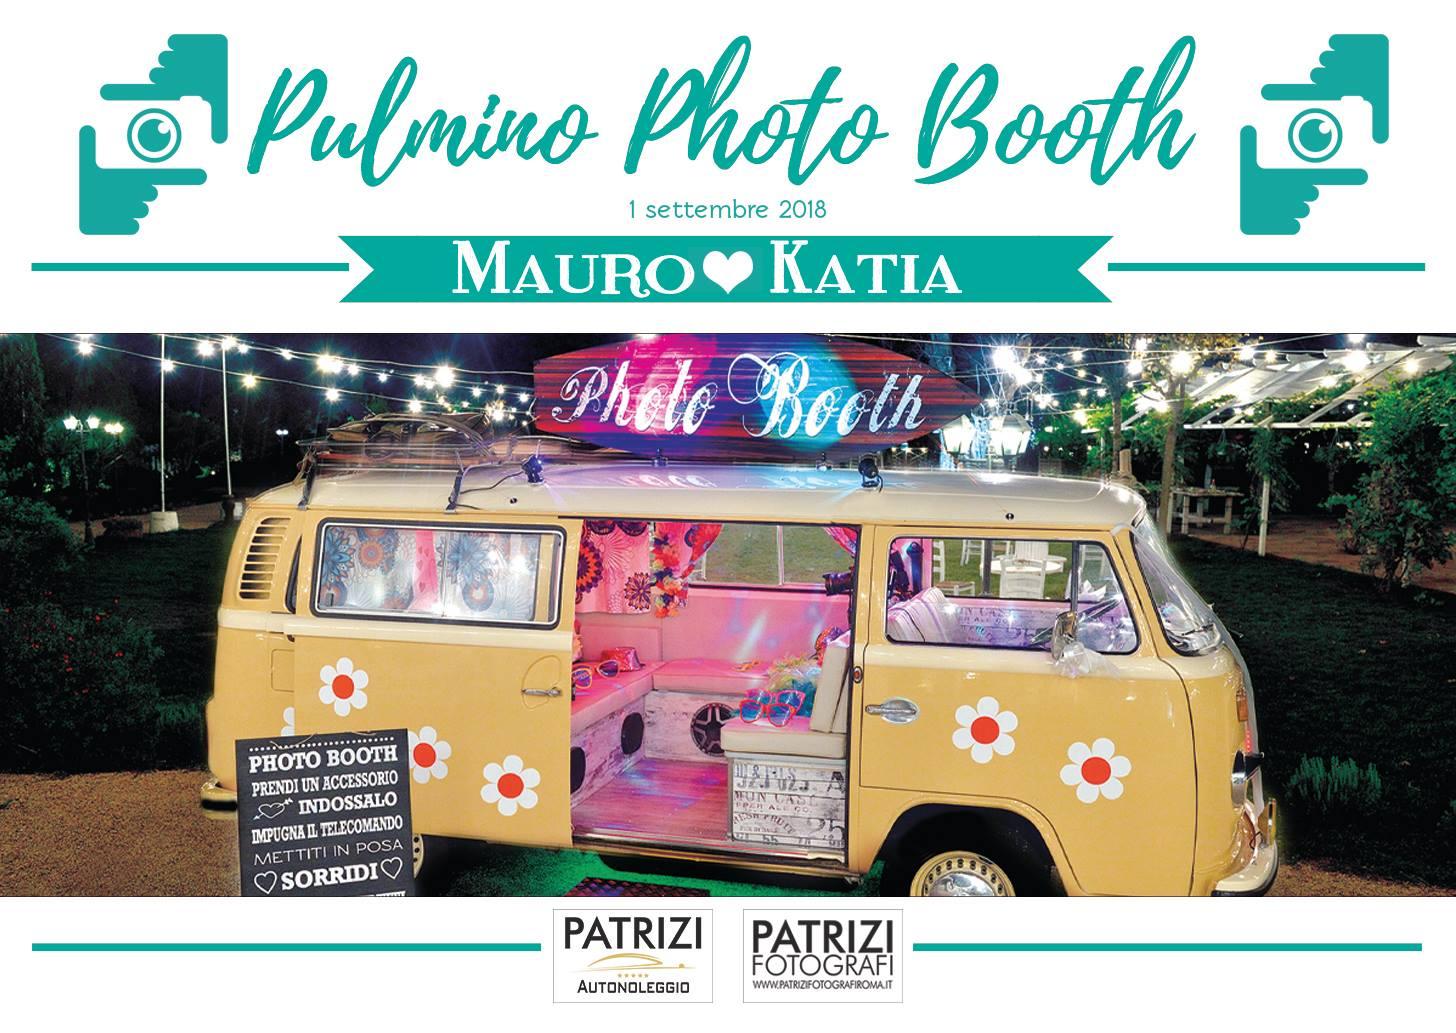 patrizi-fotografi-matrimoni-pulmino-photobooth-mauro-katia-4